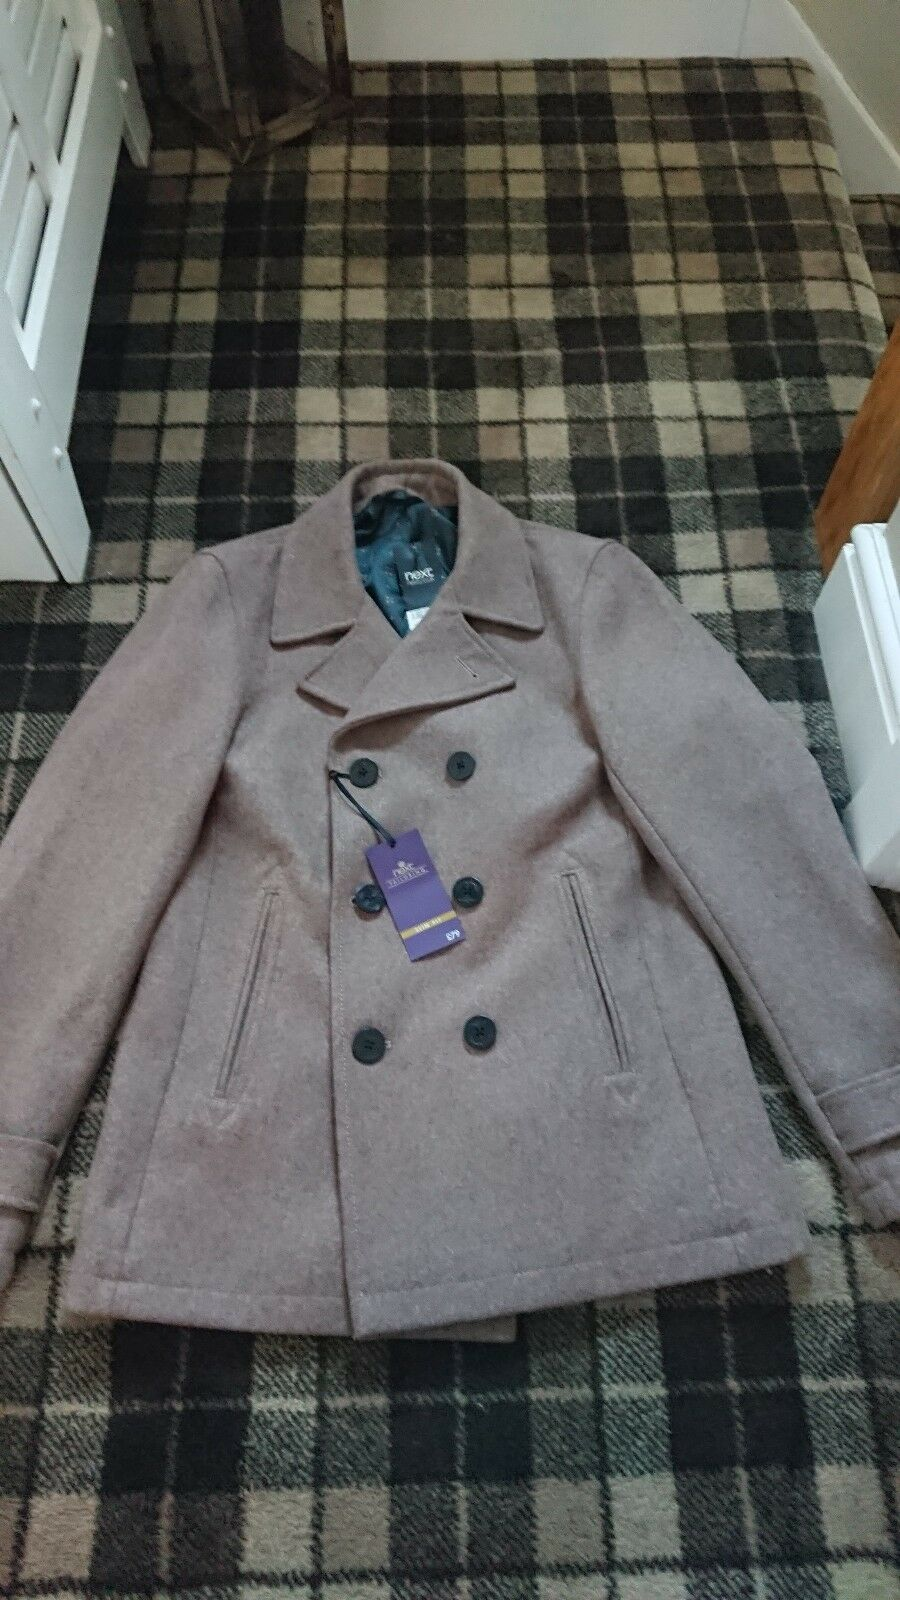 Bnwt Mens Coat Next Size Medium - Christmas Gift